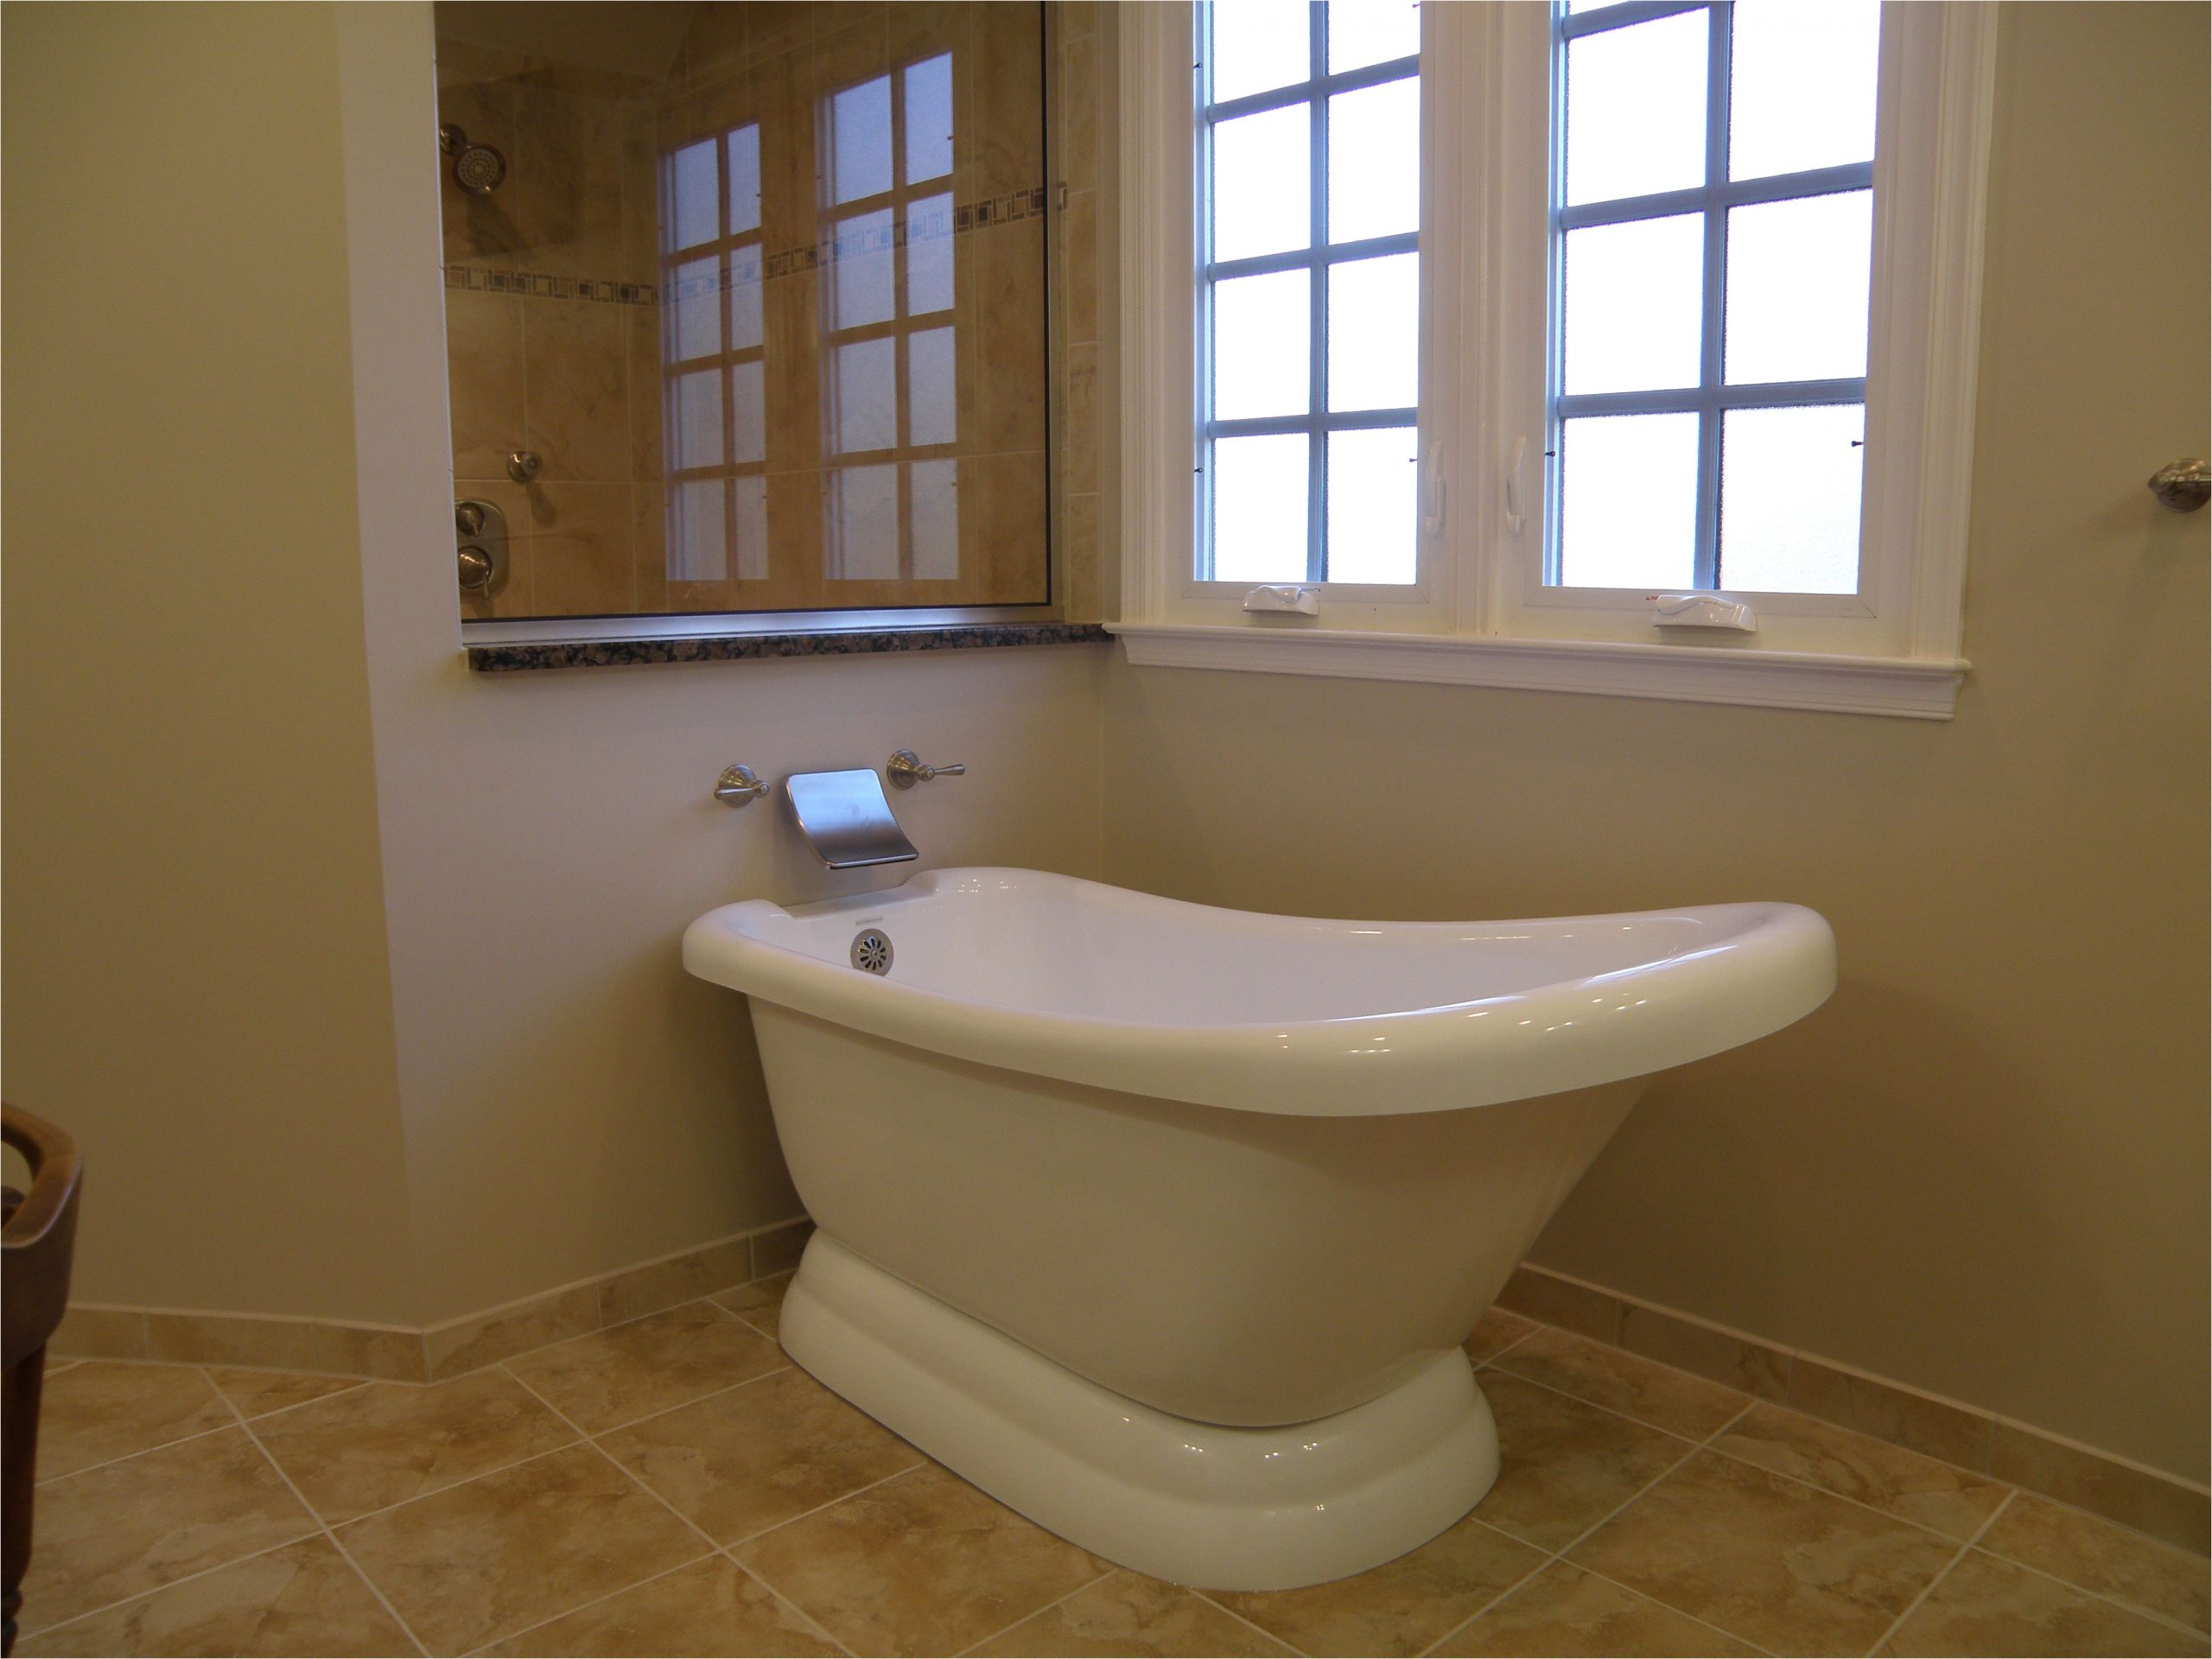 Freestanding Bathtub Faucet Lowes Bath & Shower Surprising Design for Your Bathroom with